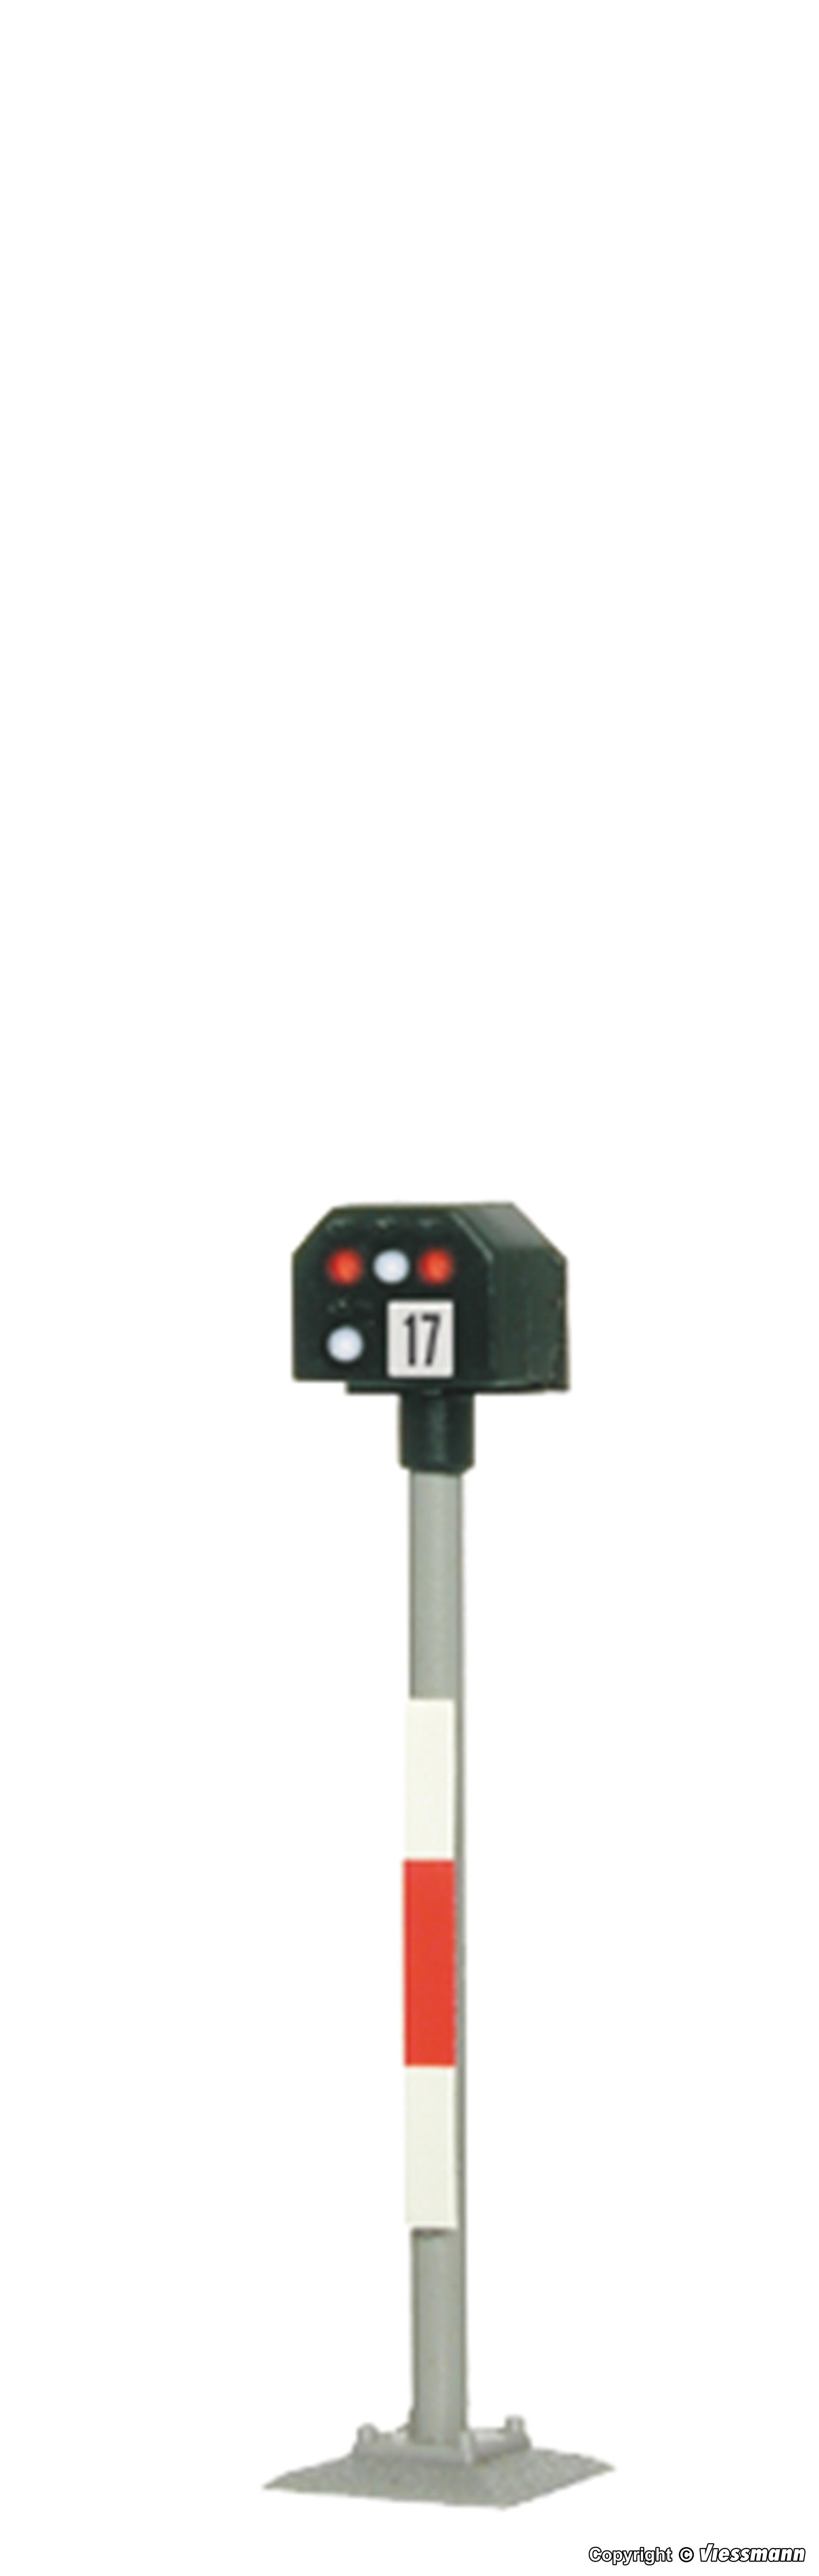 Low Viessmann 4418/ /N Light Blocking Signal